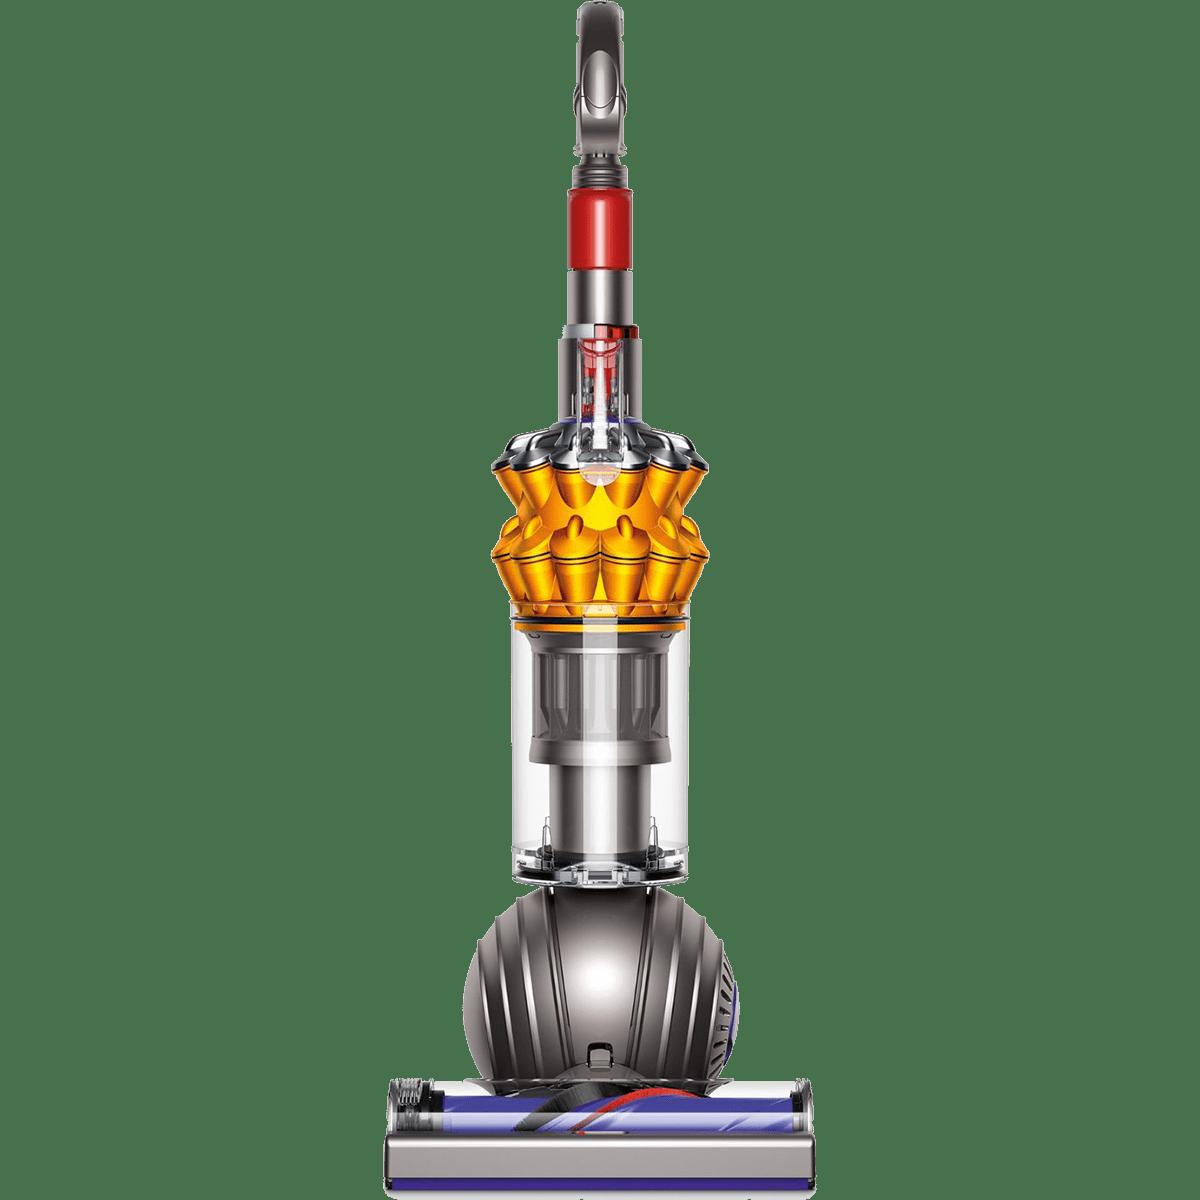 Dyson Small Ball Multi Floor Upright Vacuum Cleaner Sylvane